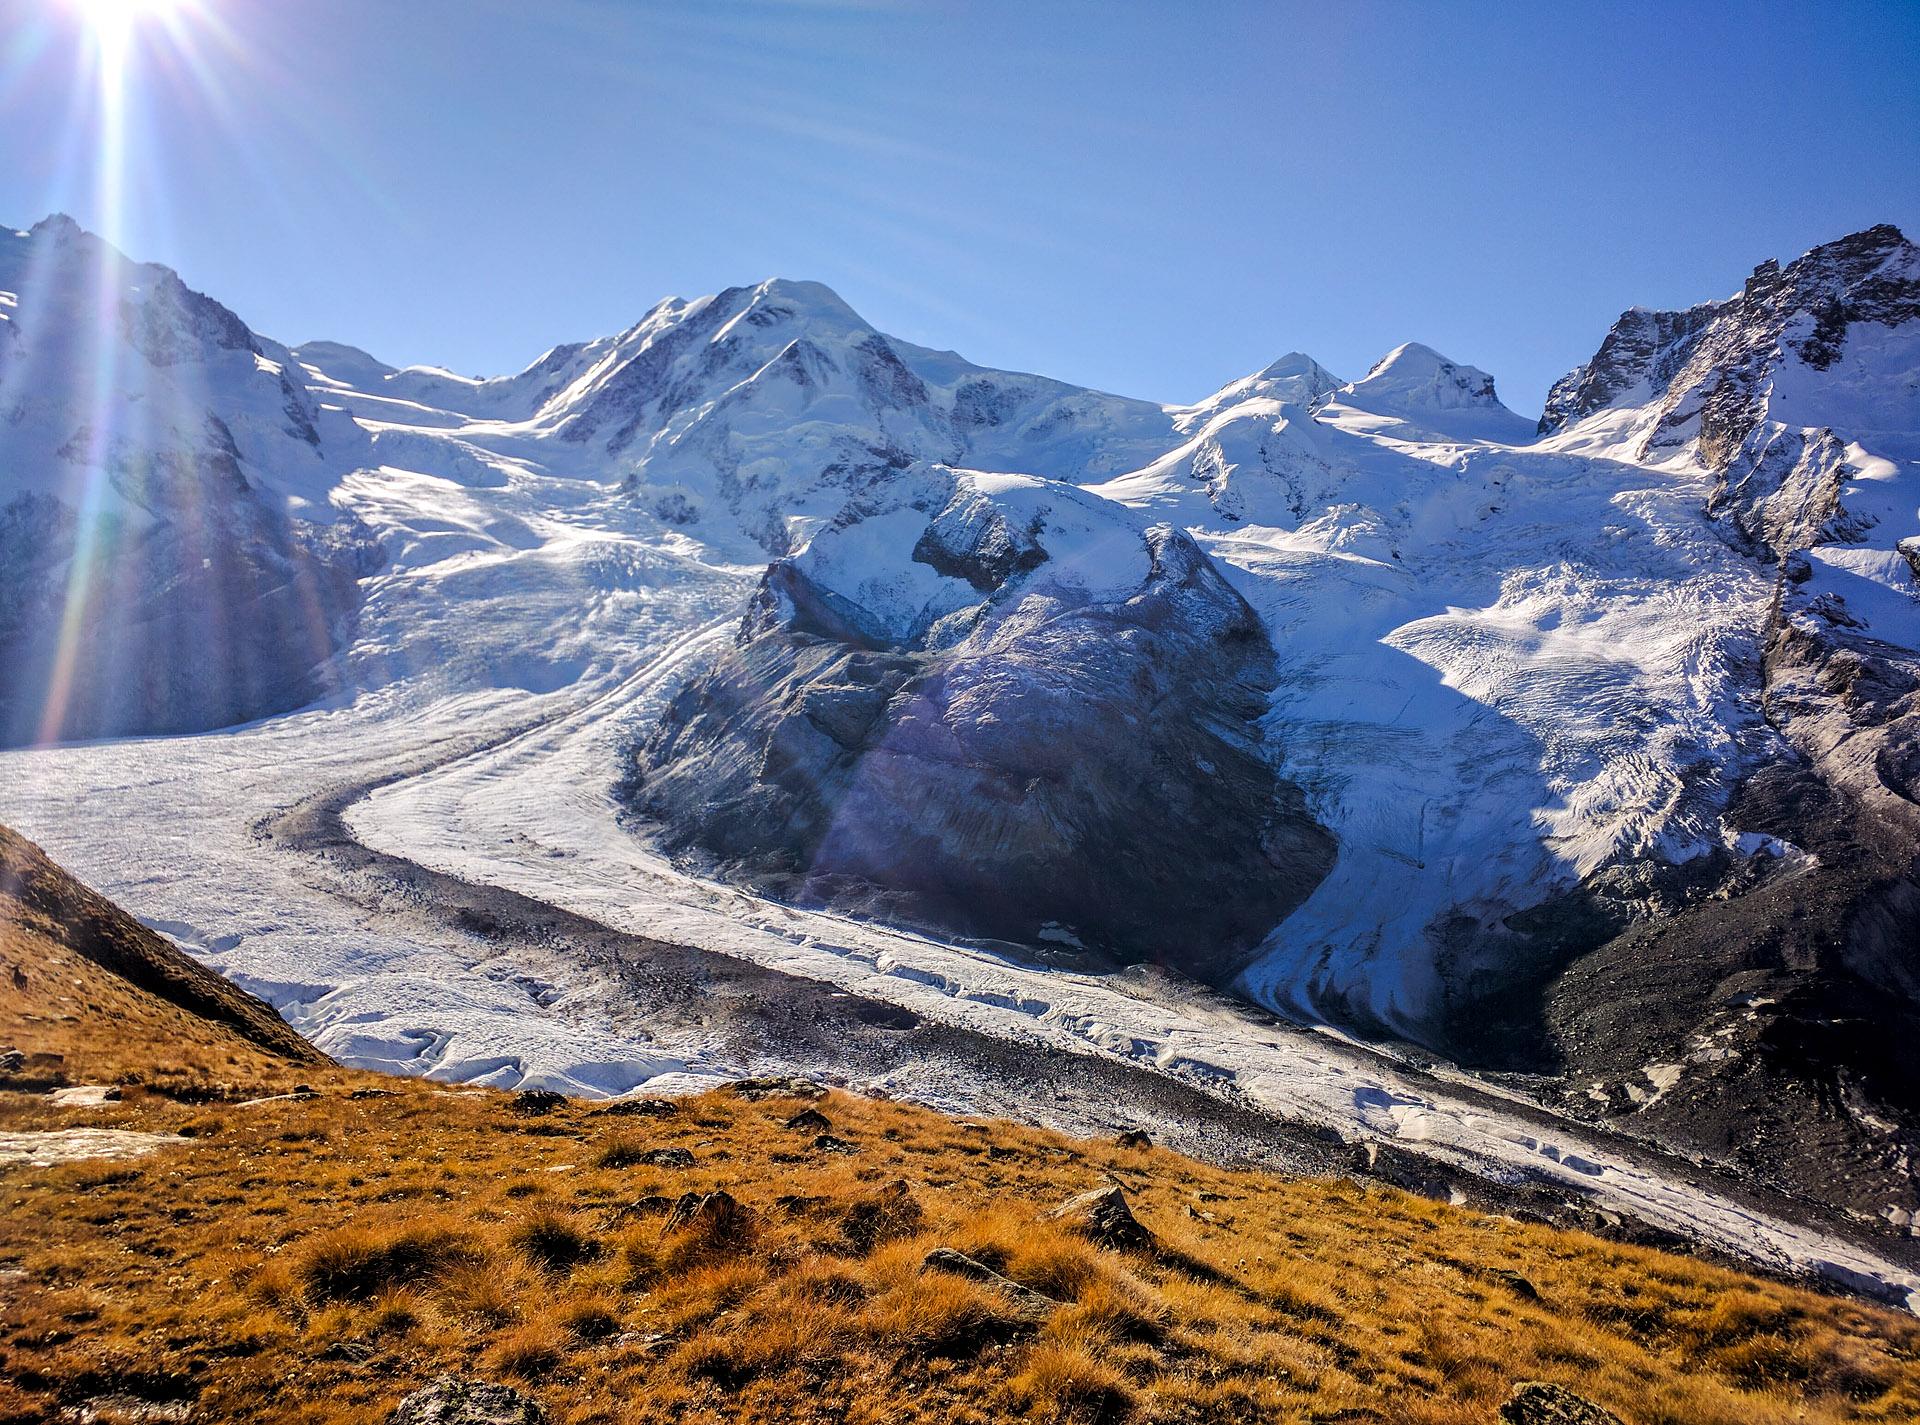 Gorner Glacier (Gorner Valley)